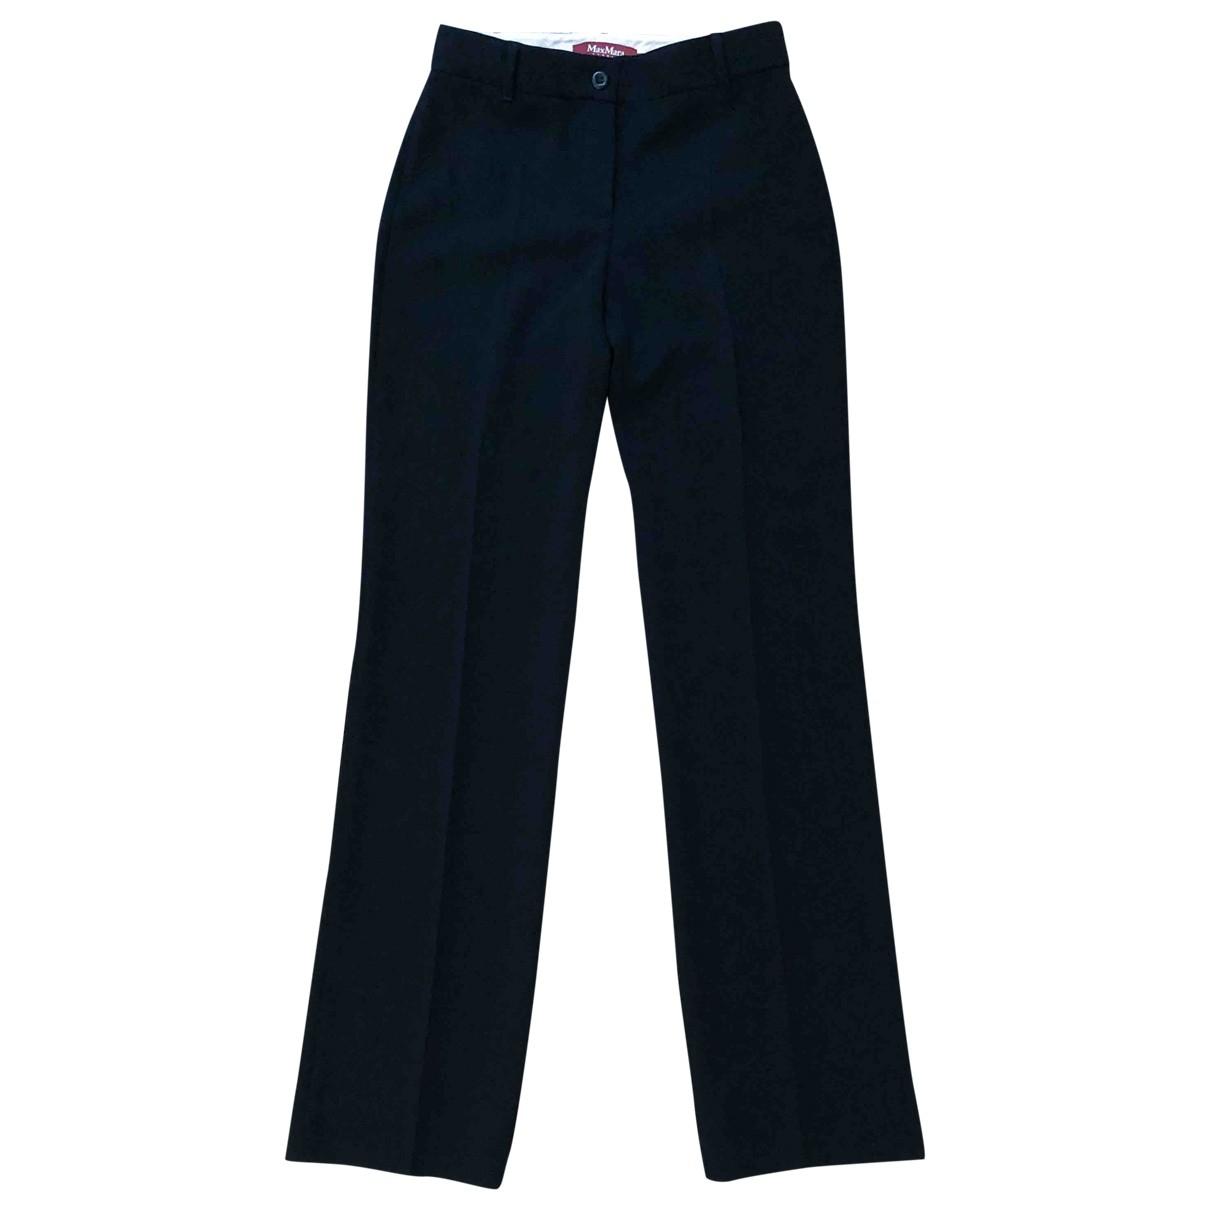 Max Mara Studio \N Black Trousers for Women 36 FR